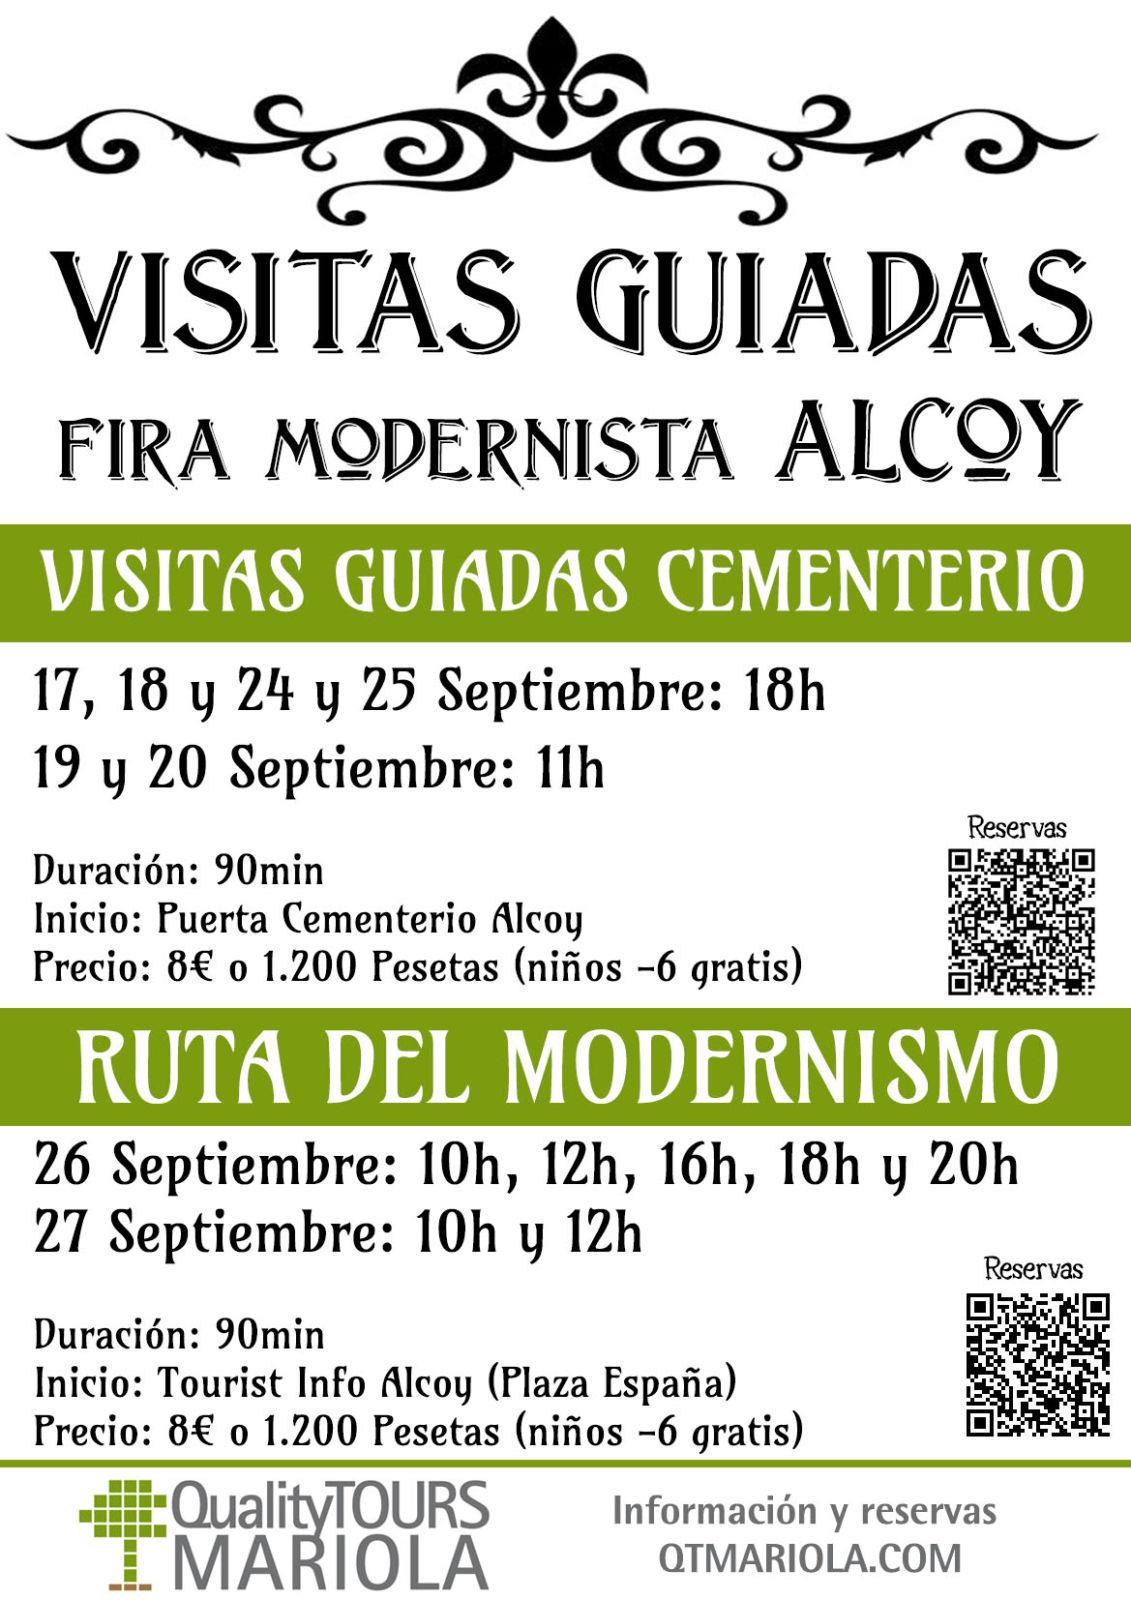 Visitas guiadas cementerio y ruta modernismo alcoy durante feria modernismo